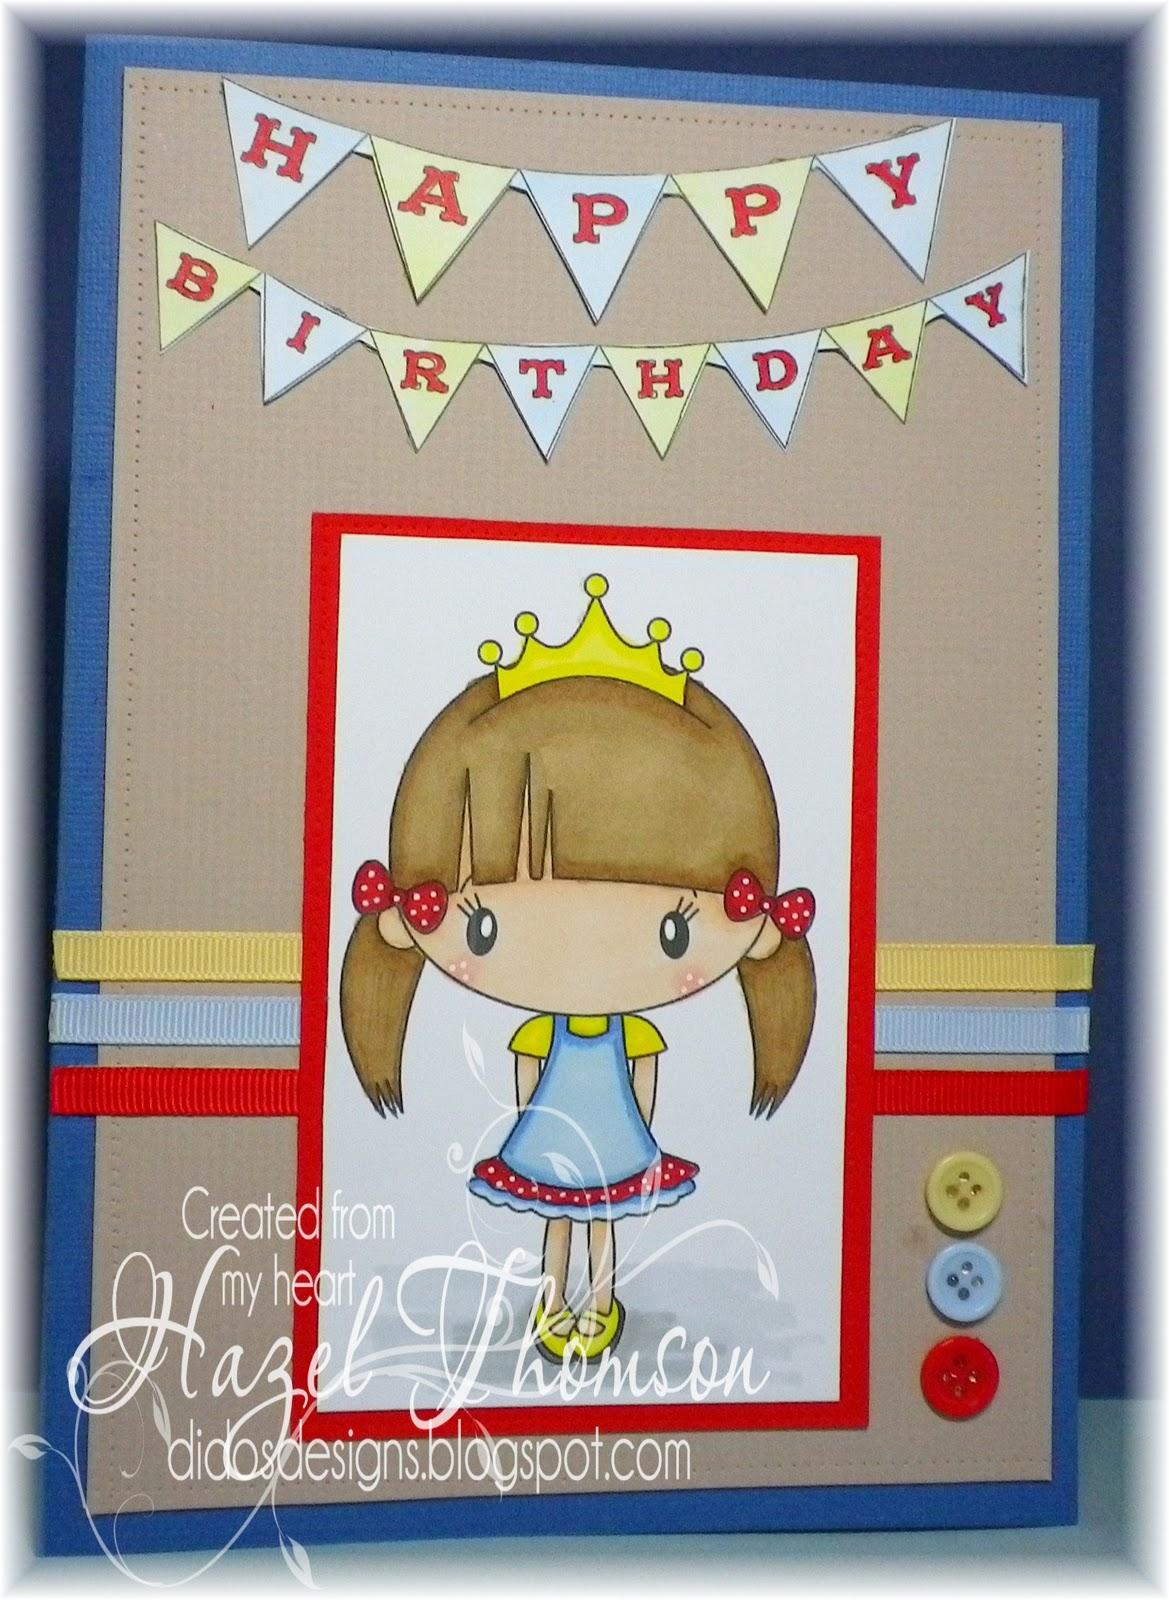 http://2.bp.blogspot.com/-fGb8ln6Hbdg/Tykip_OkozI/AAAAAAAAA18/nIt908uV2Tg/s1600/Cards+By+Dido%2527s+Designs+004.JPG